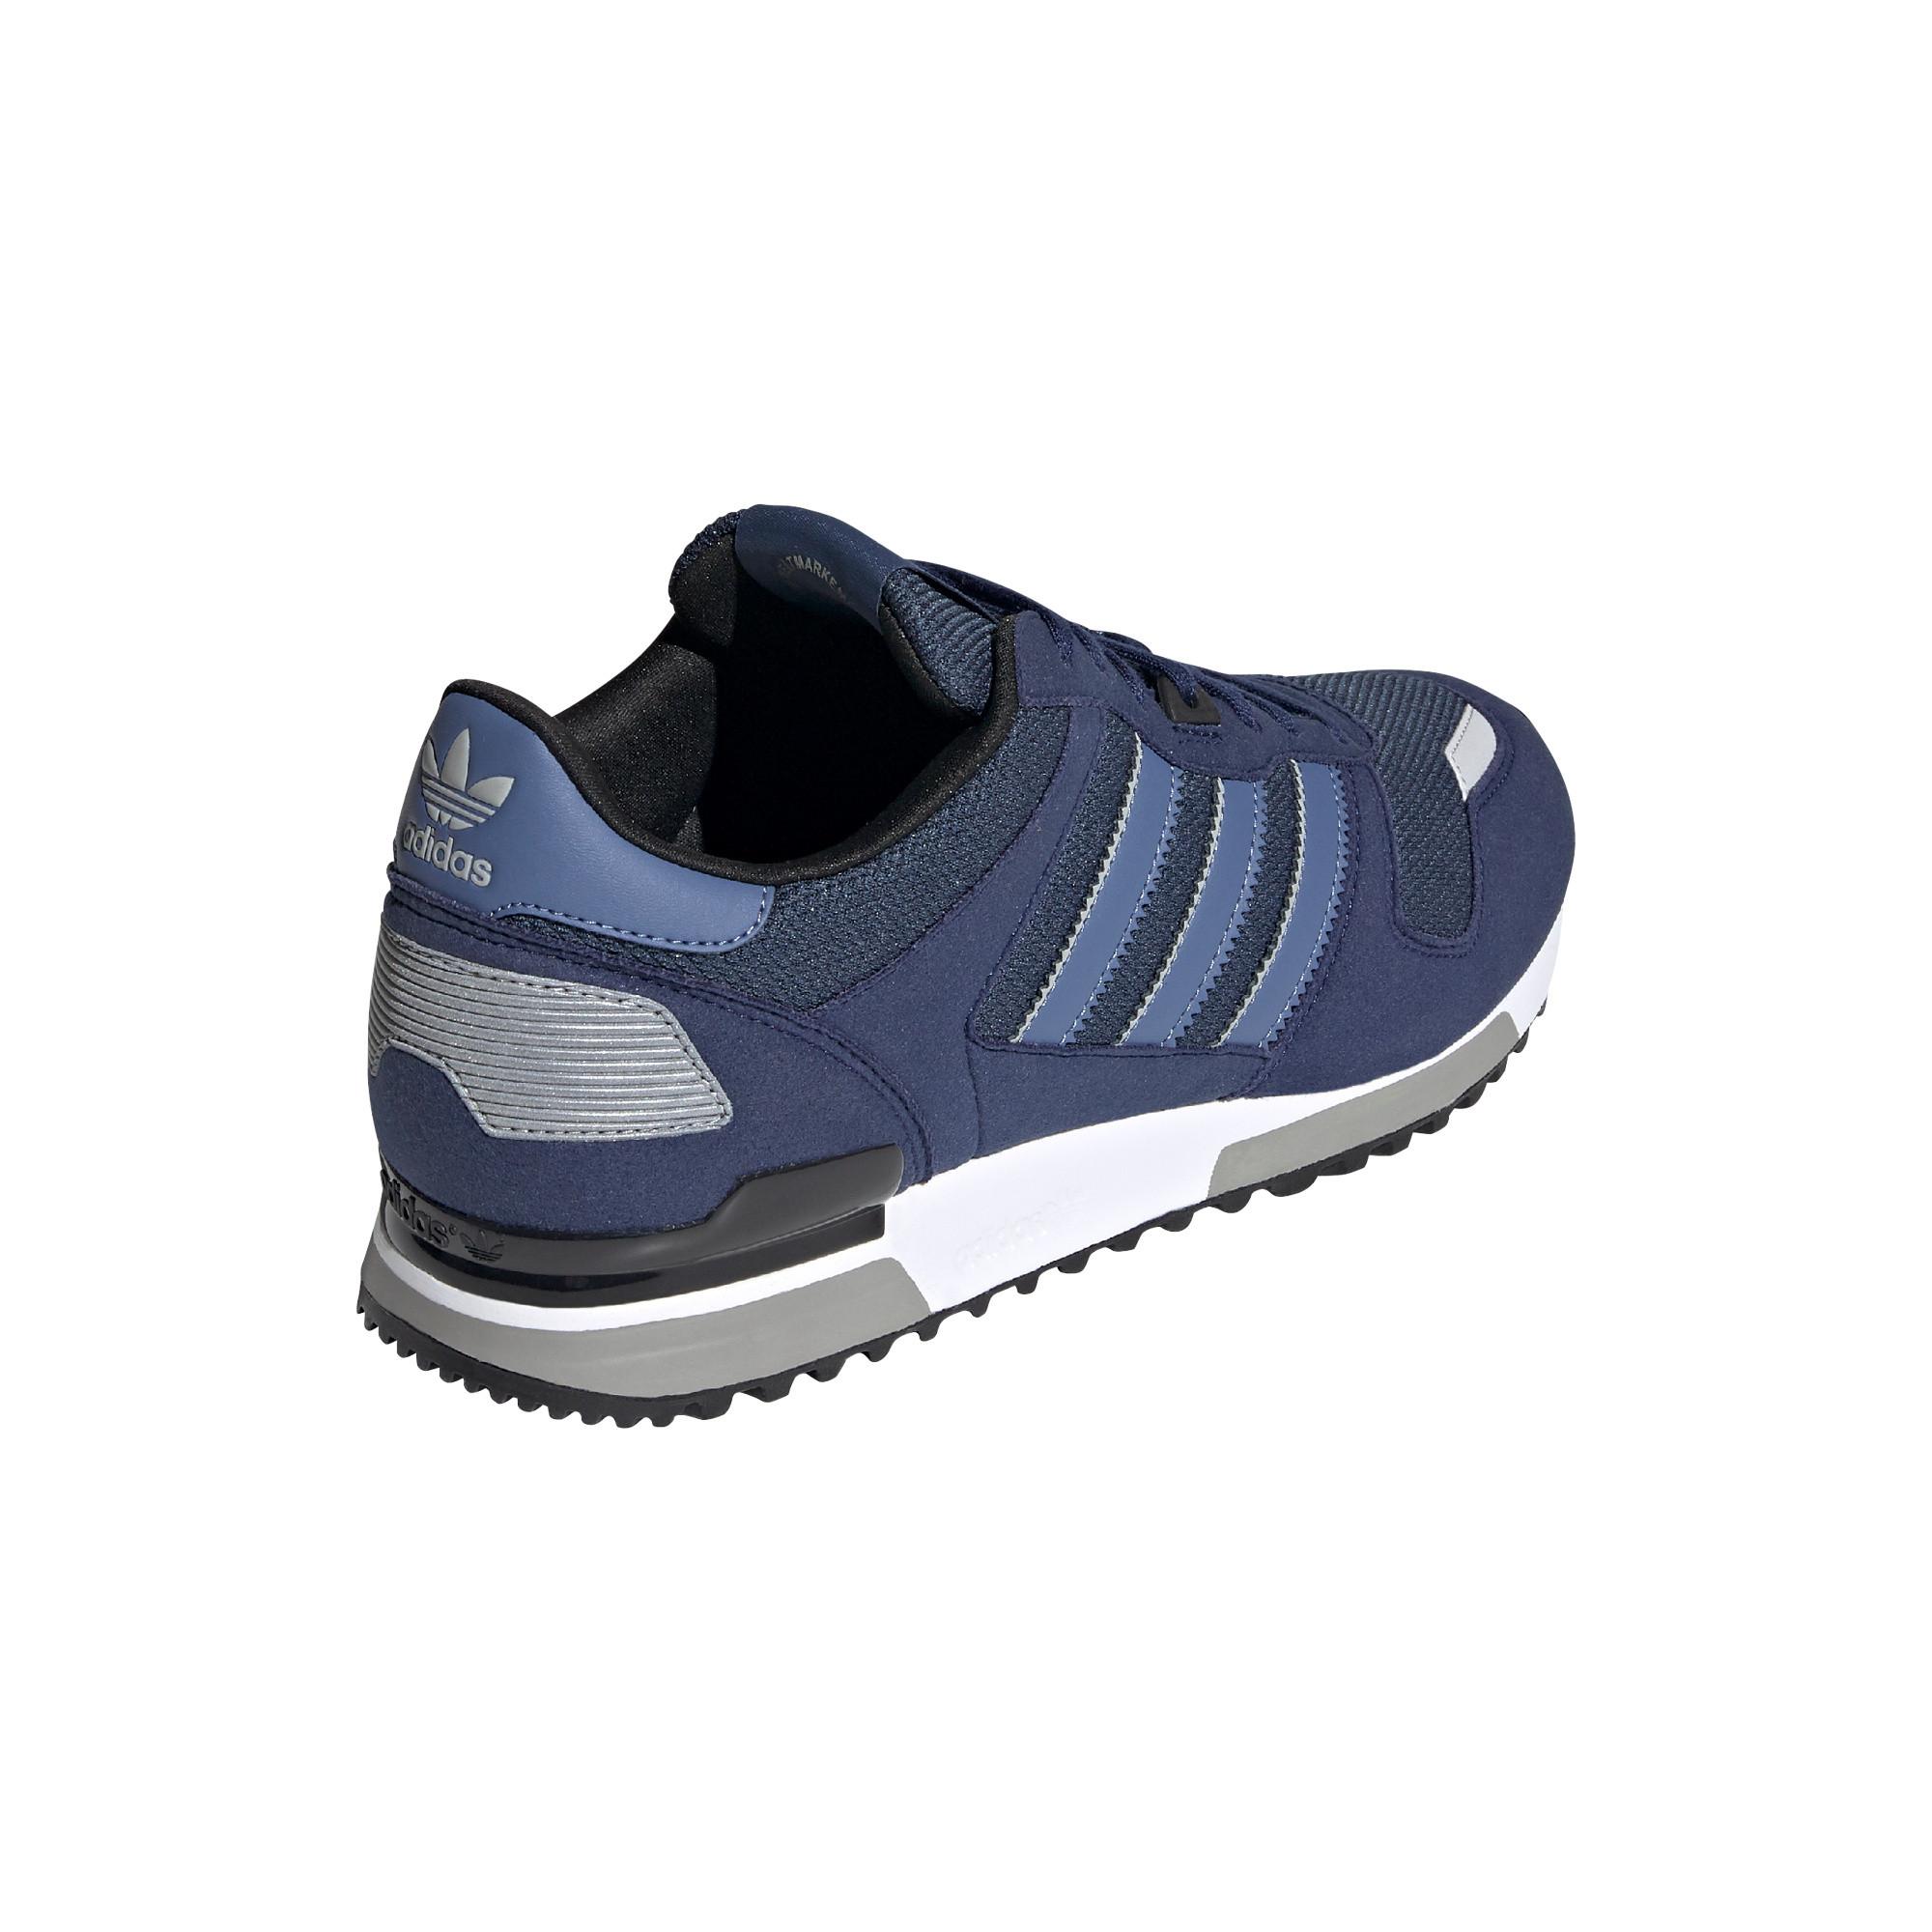 Scarpe uomo ZX 700, Blu scuro, large image number 4